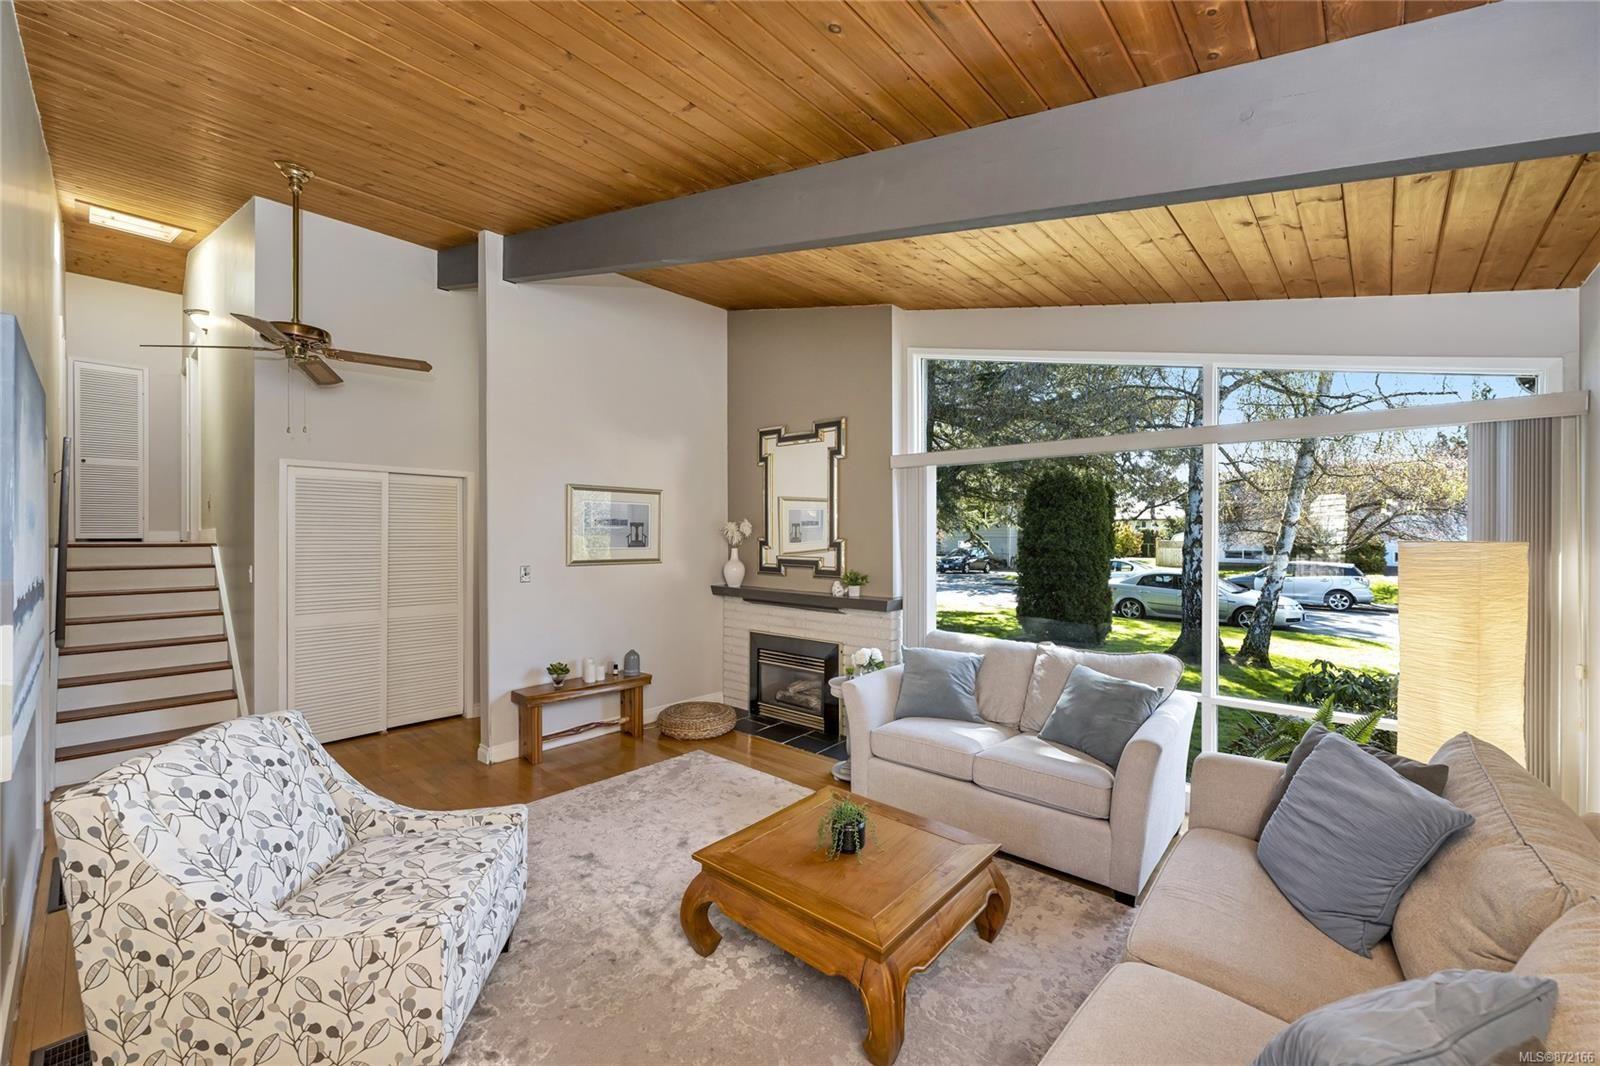 Photo 5: Photos: 1690 Blair Ave in : SE Lambrick Park House for sale (Saanich East)  : MLS®# 872166